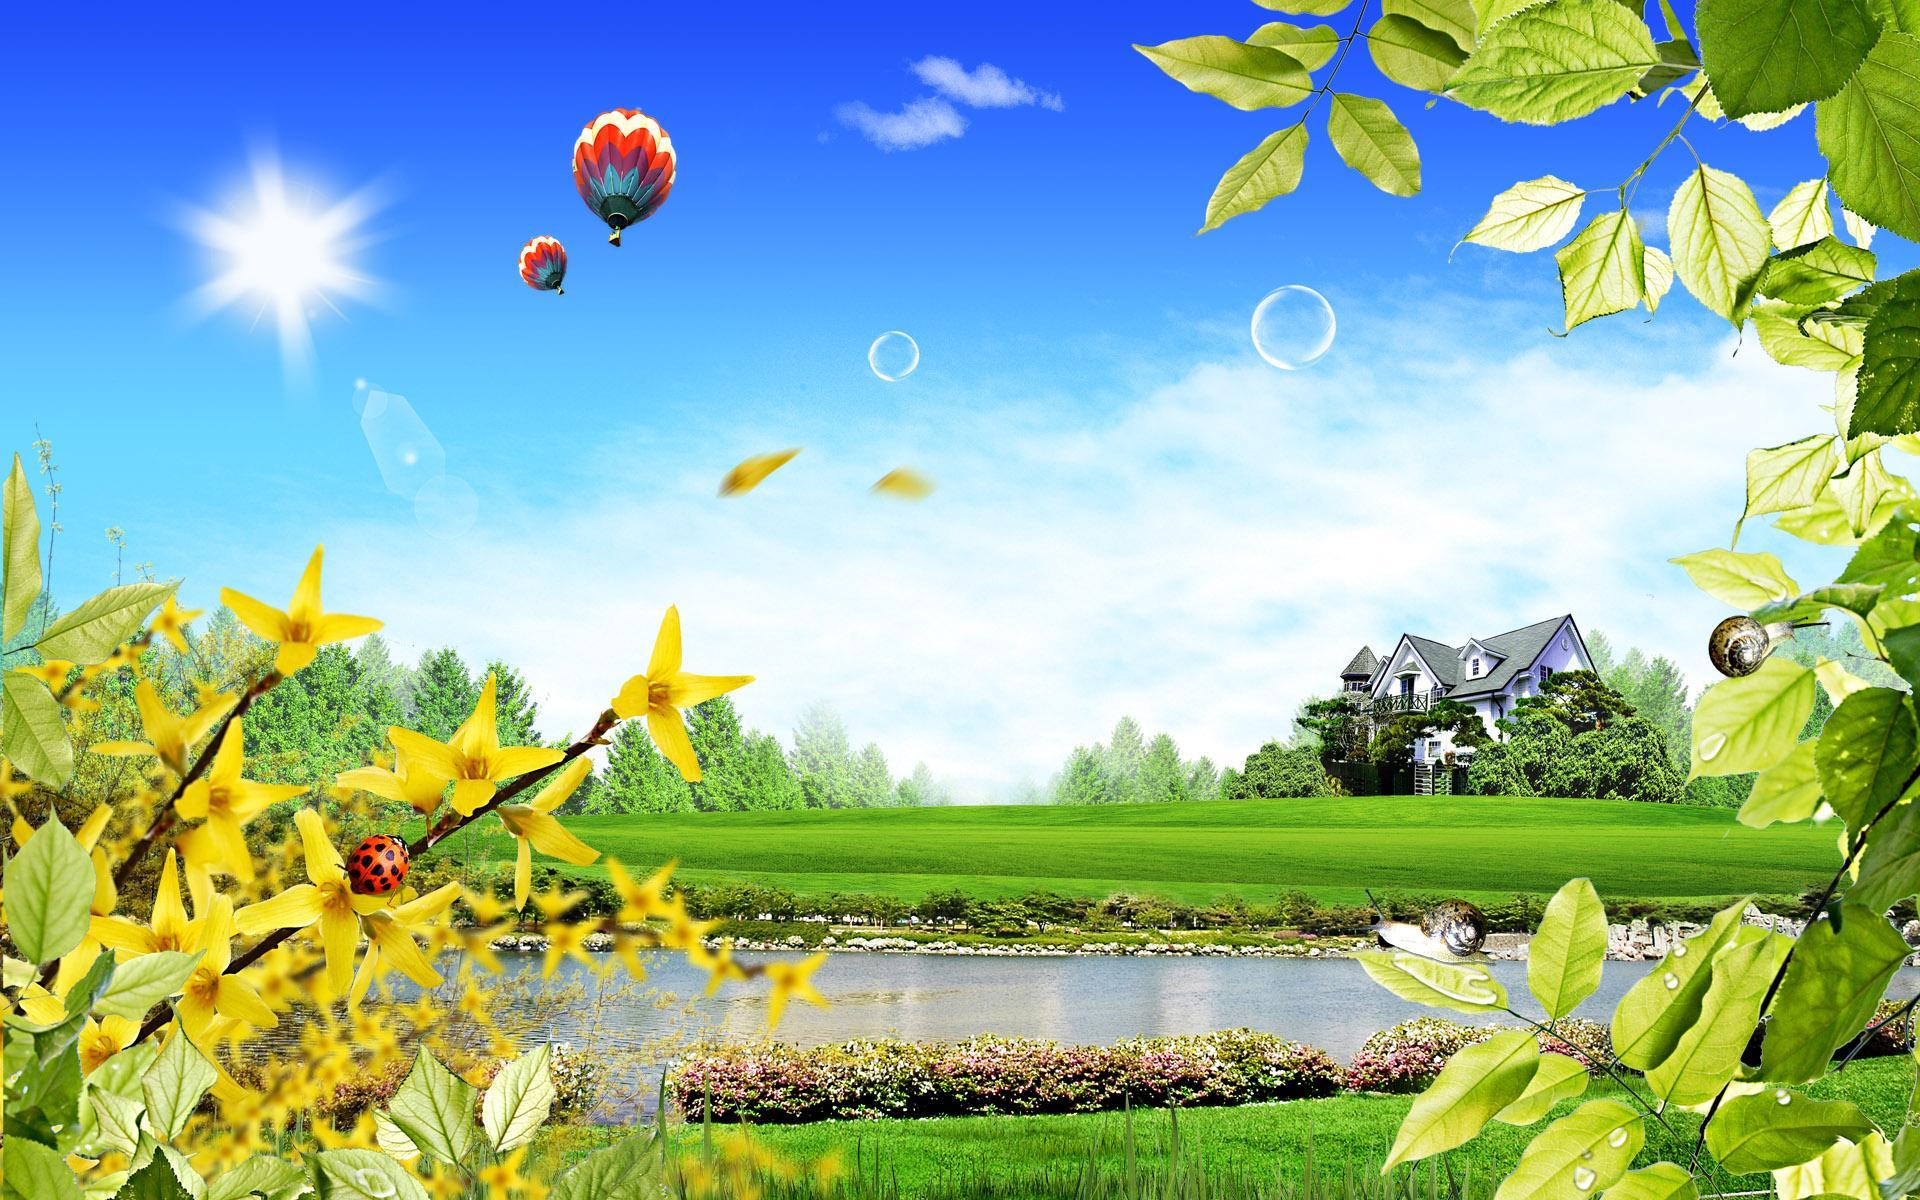 mi9comfree summer fantasy landscape for desktop wallpaper 80970html 1920x1200